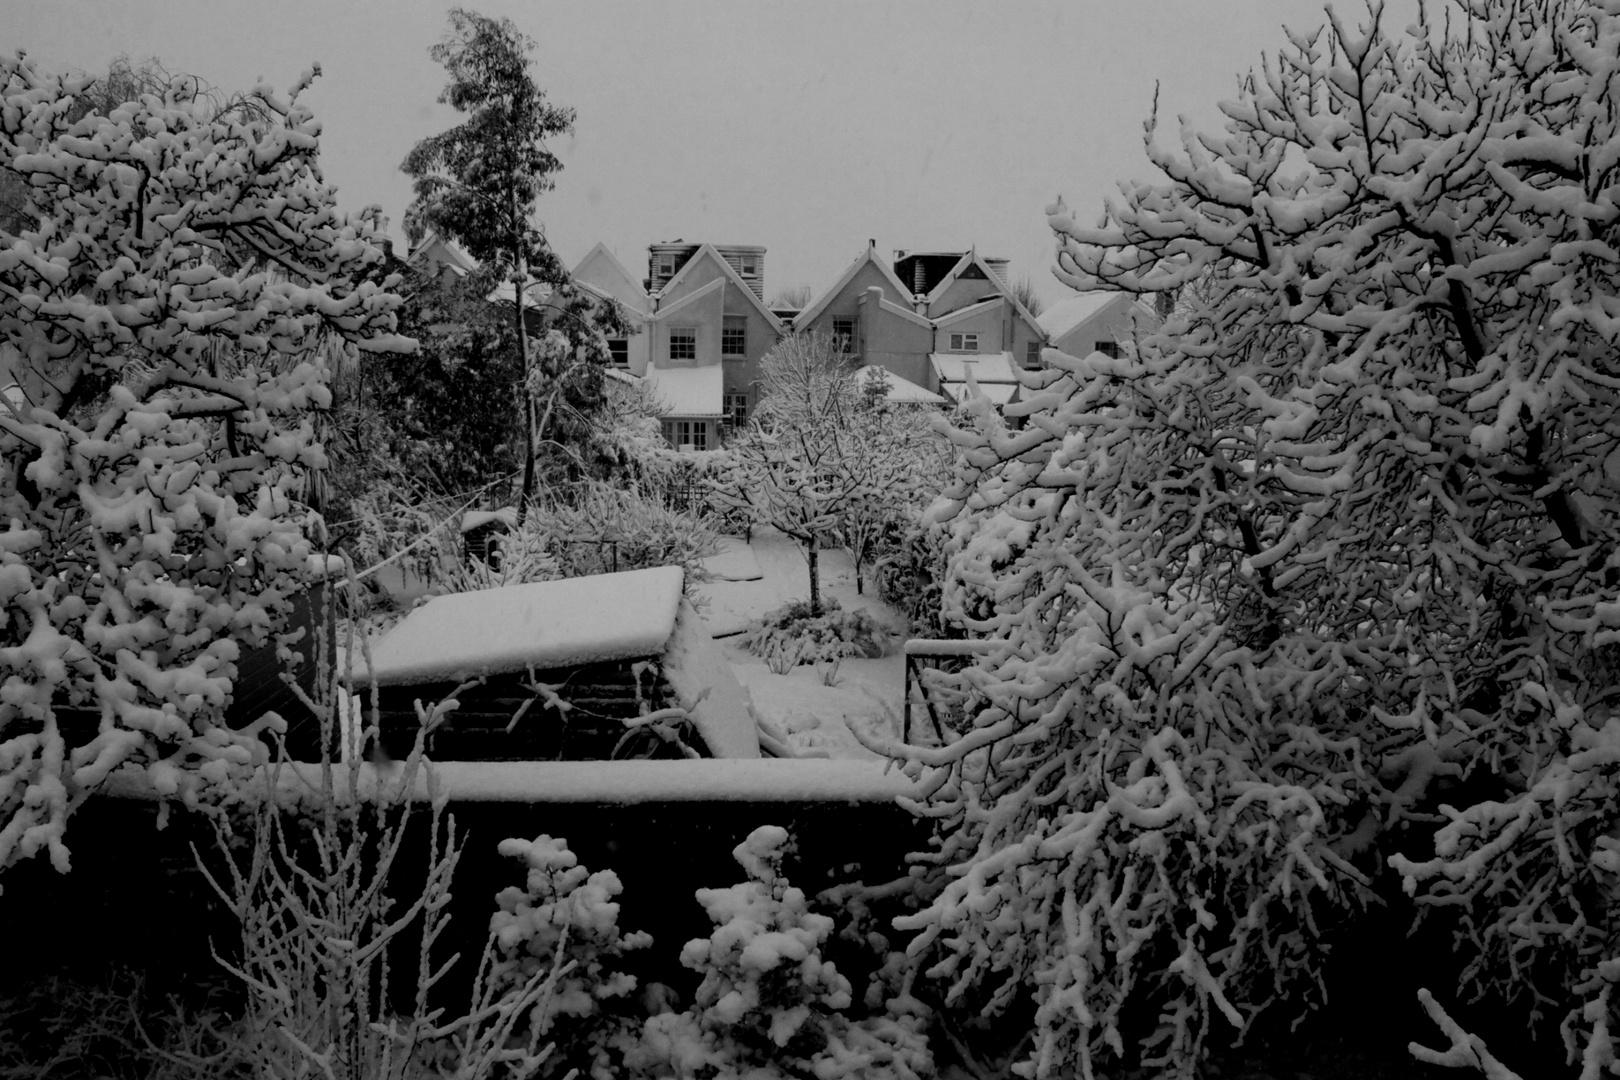 Mañana nevada...